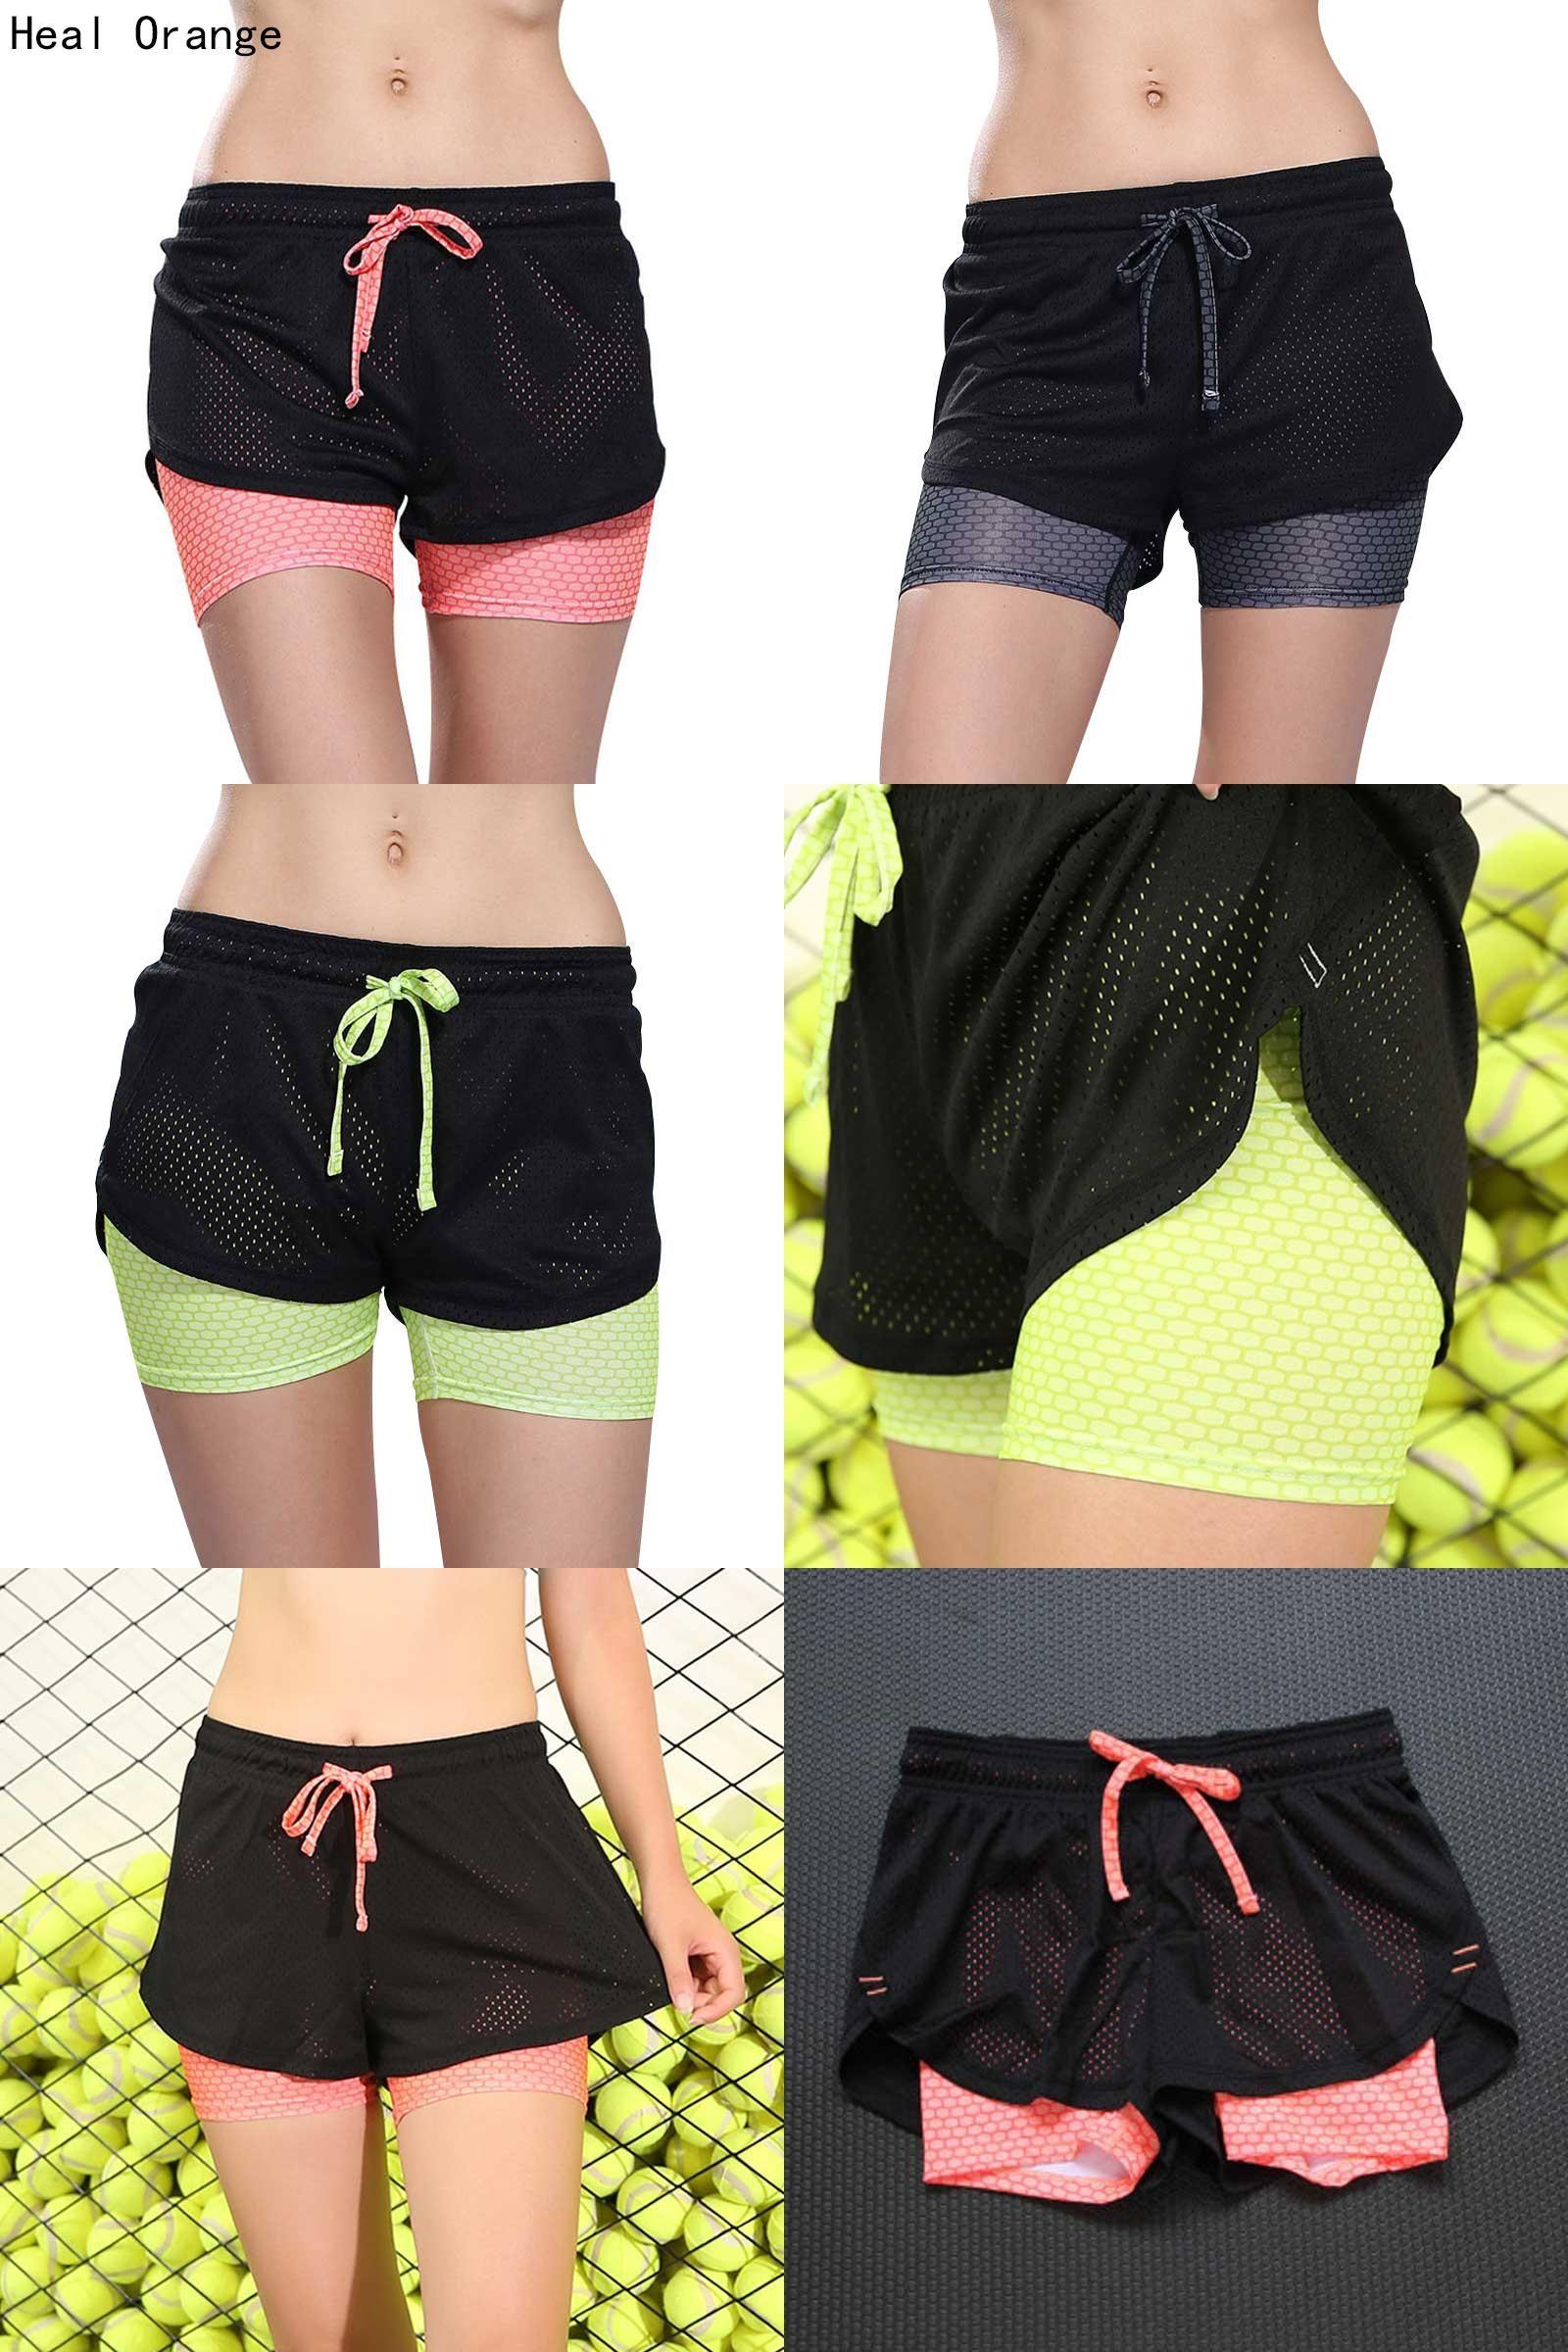 d9b9631840da  Visit to Buy  Heal Orange Women Sport Fitness Yoga Shorts 2 In 1 Women